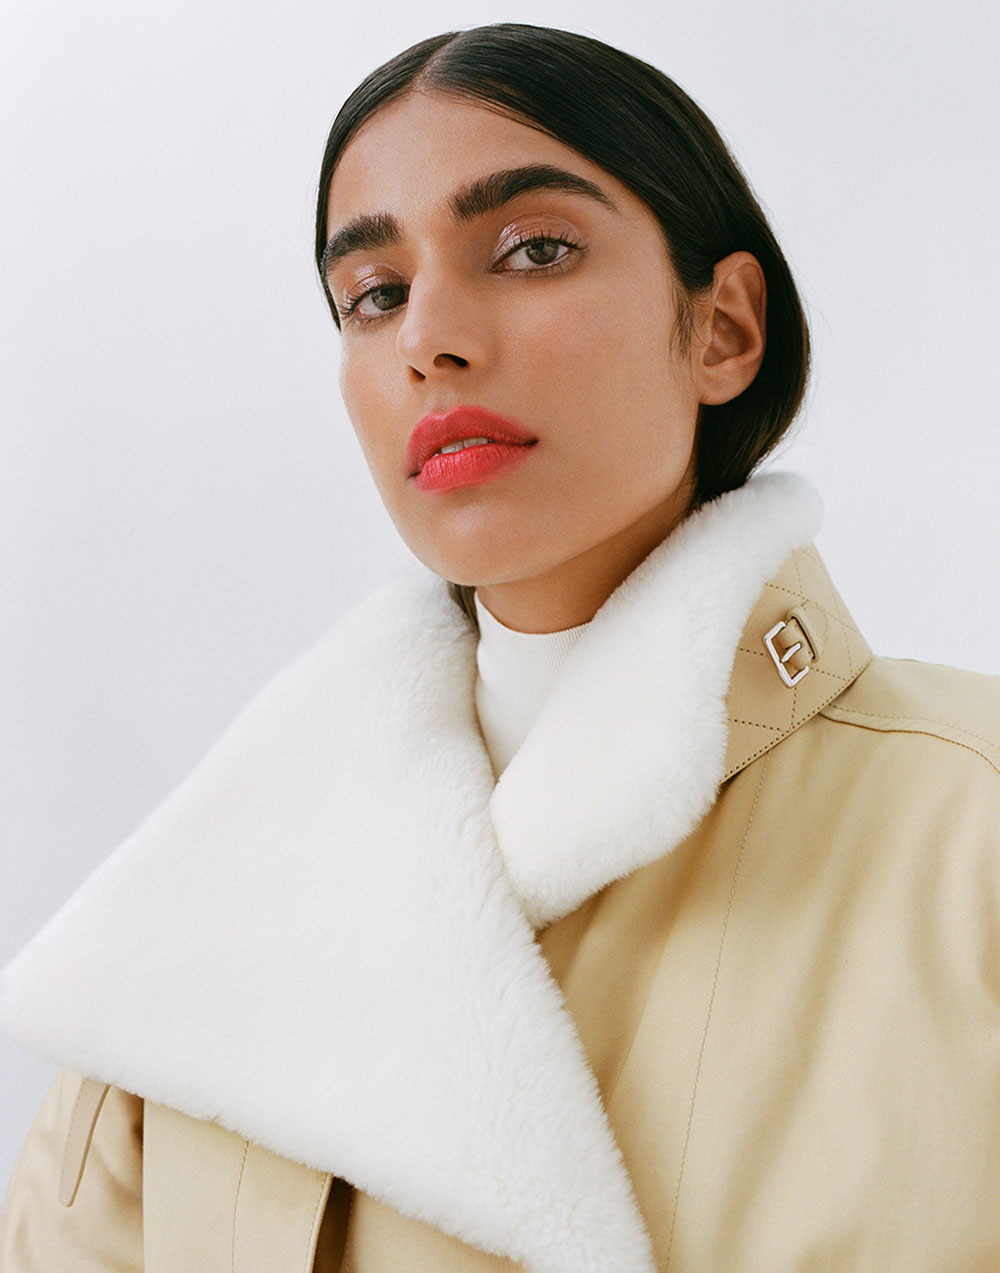 Anisha Sandhu by Andrew Stinson for DuJour Magazine Winter 2020